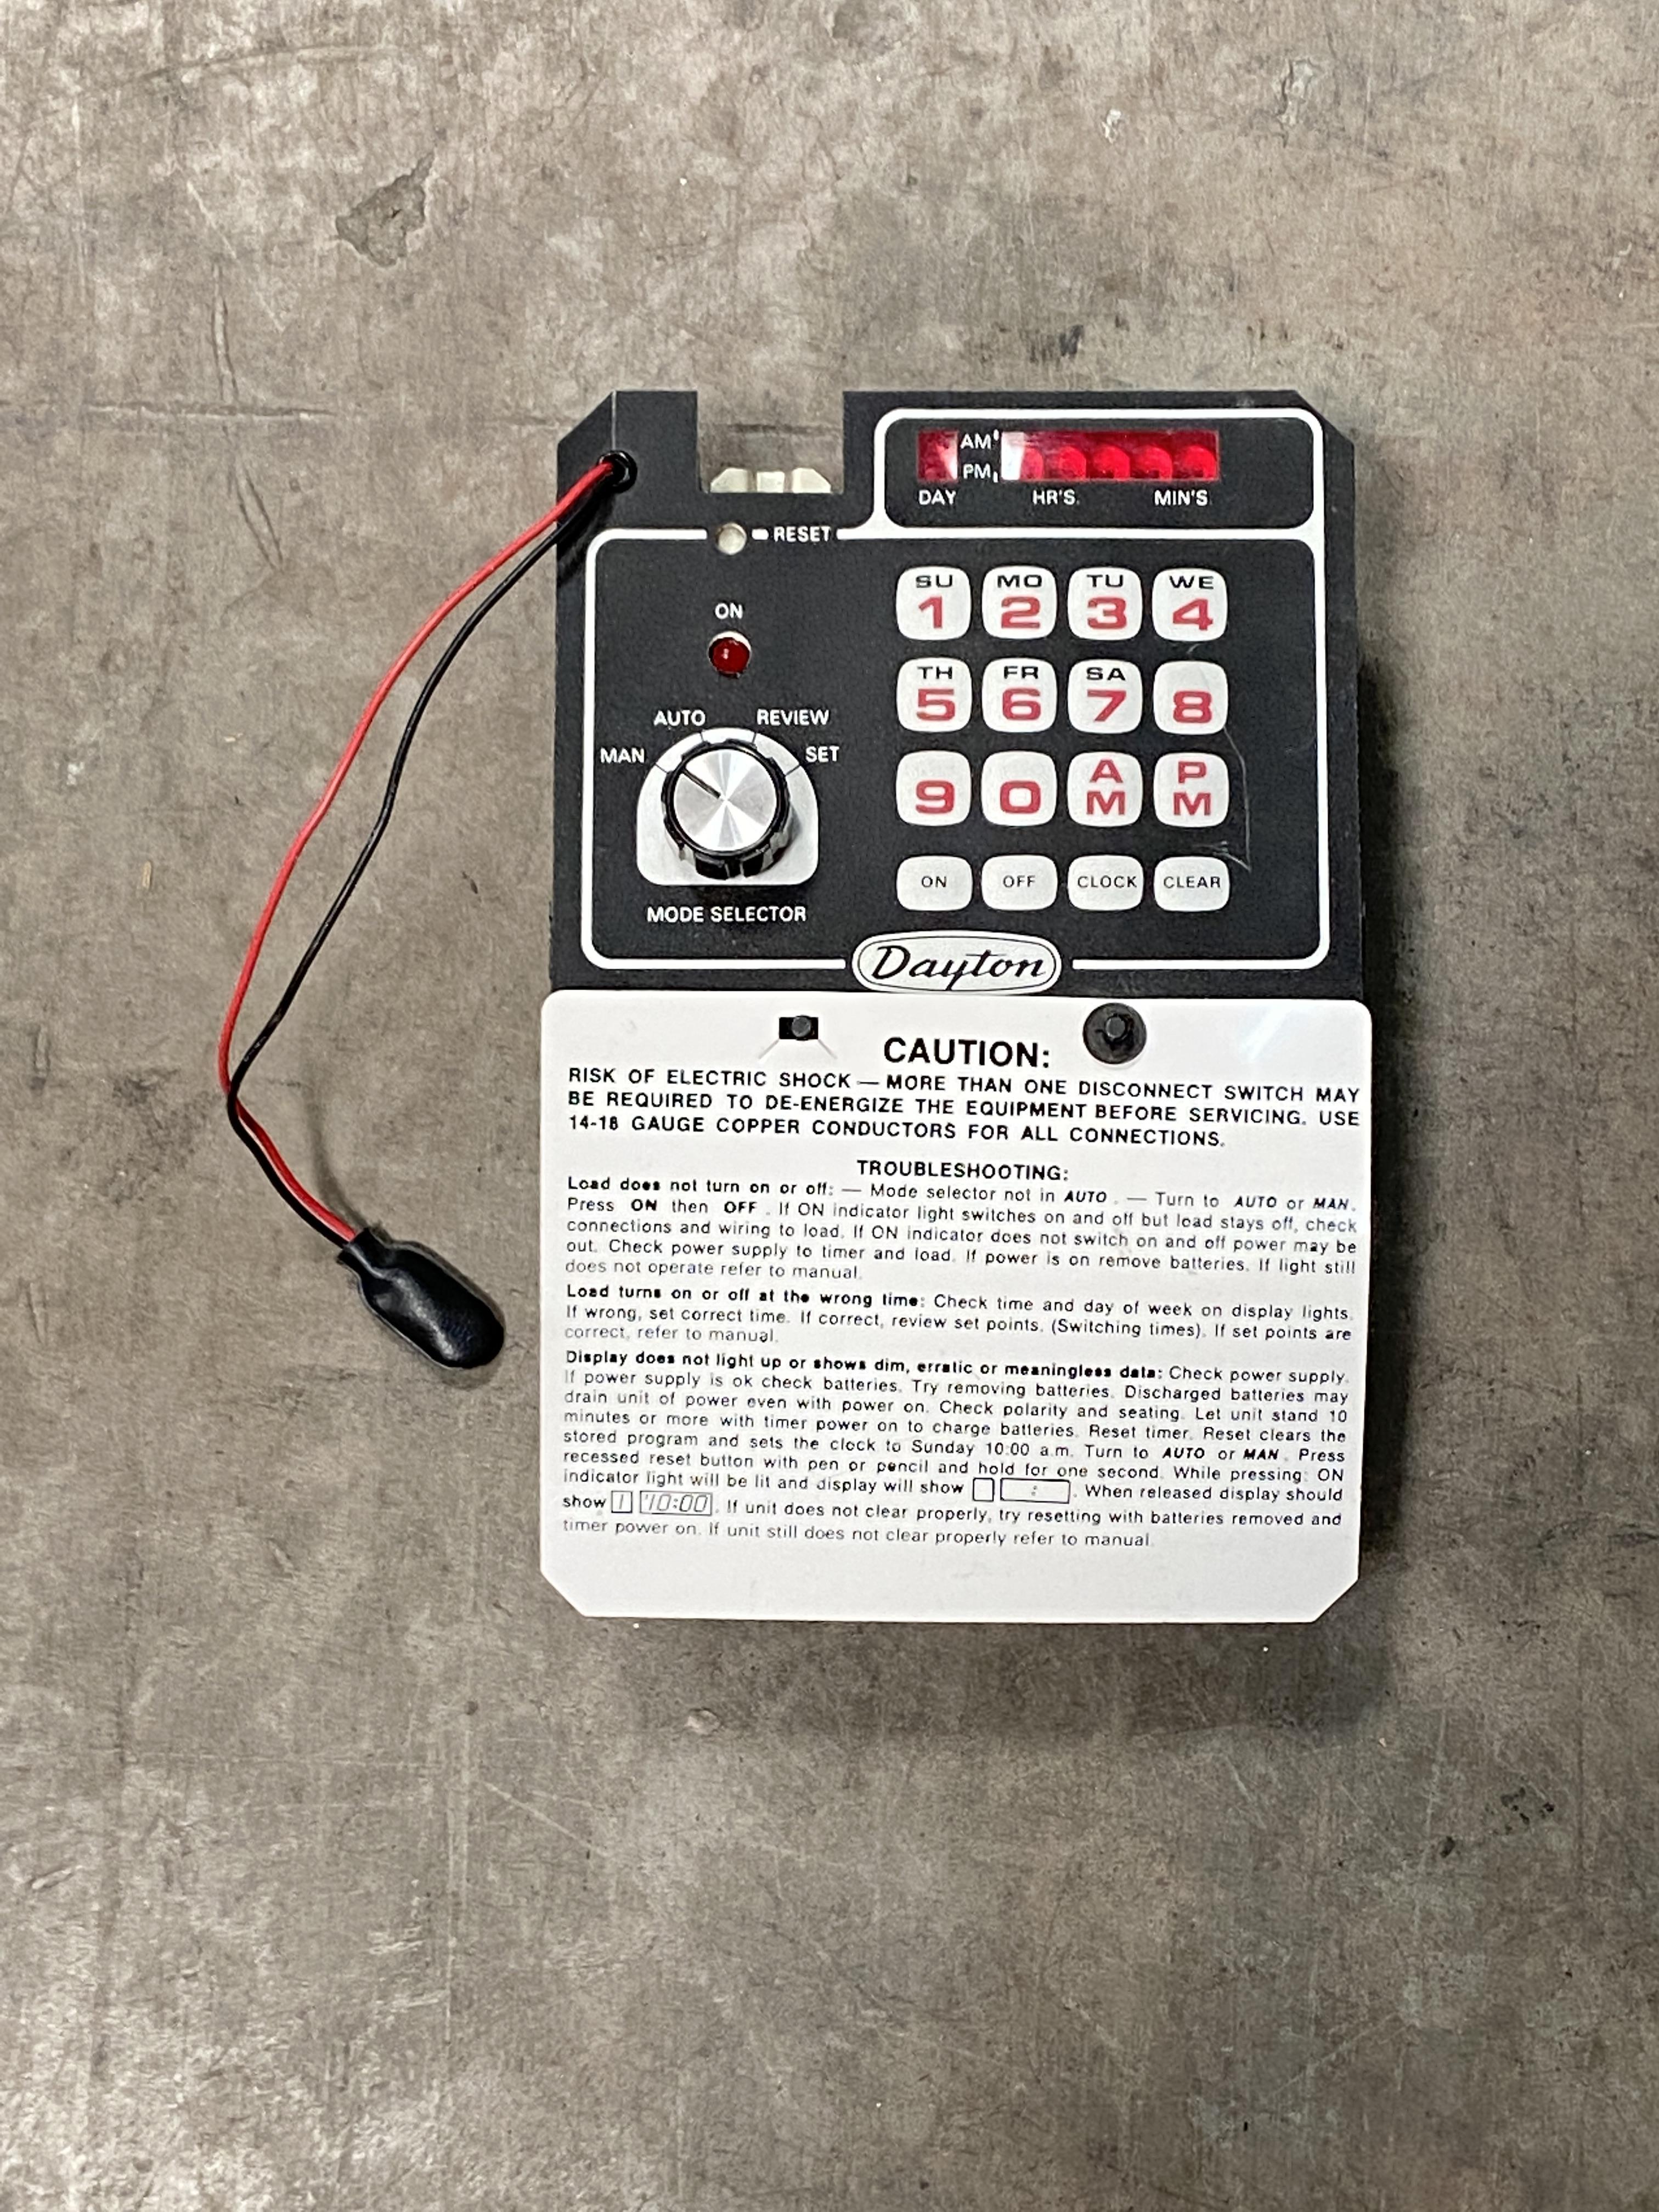 Lot 1R - Dayton Control Panel